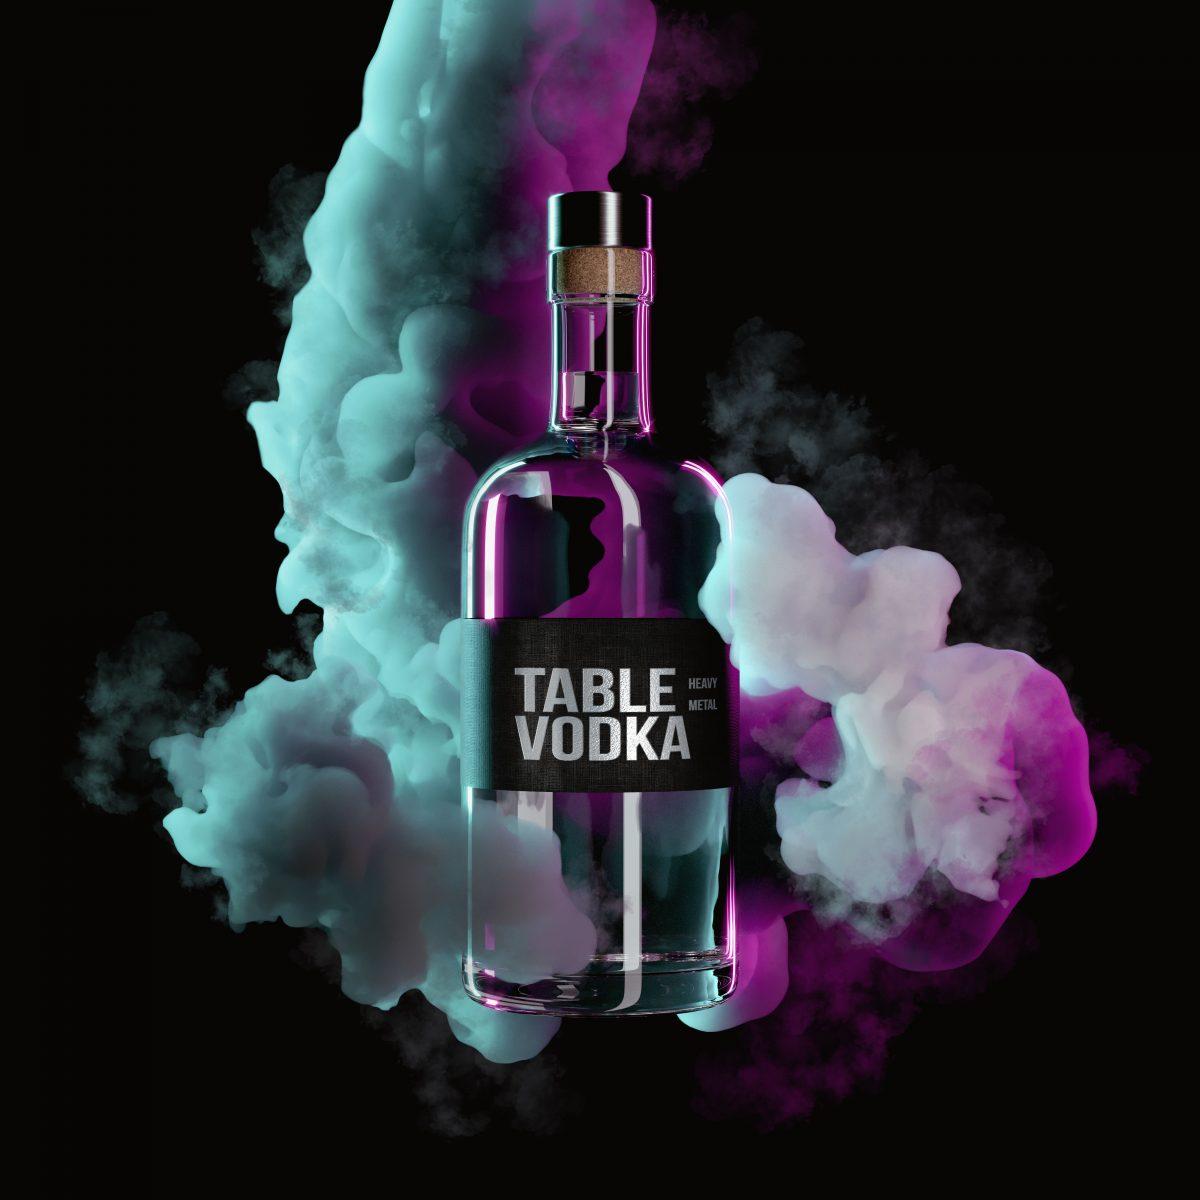 Alcohol Bottles Image